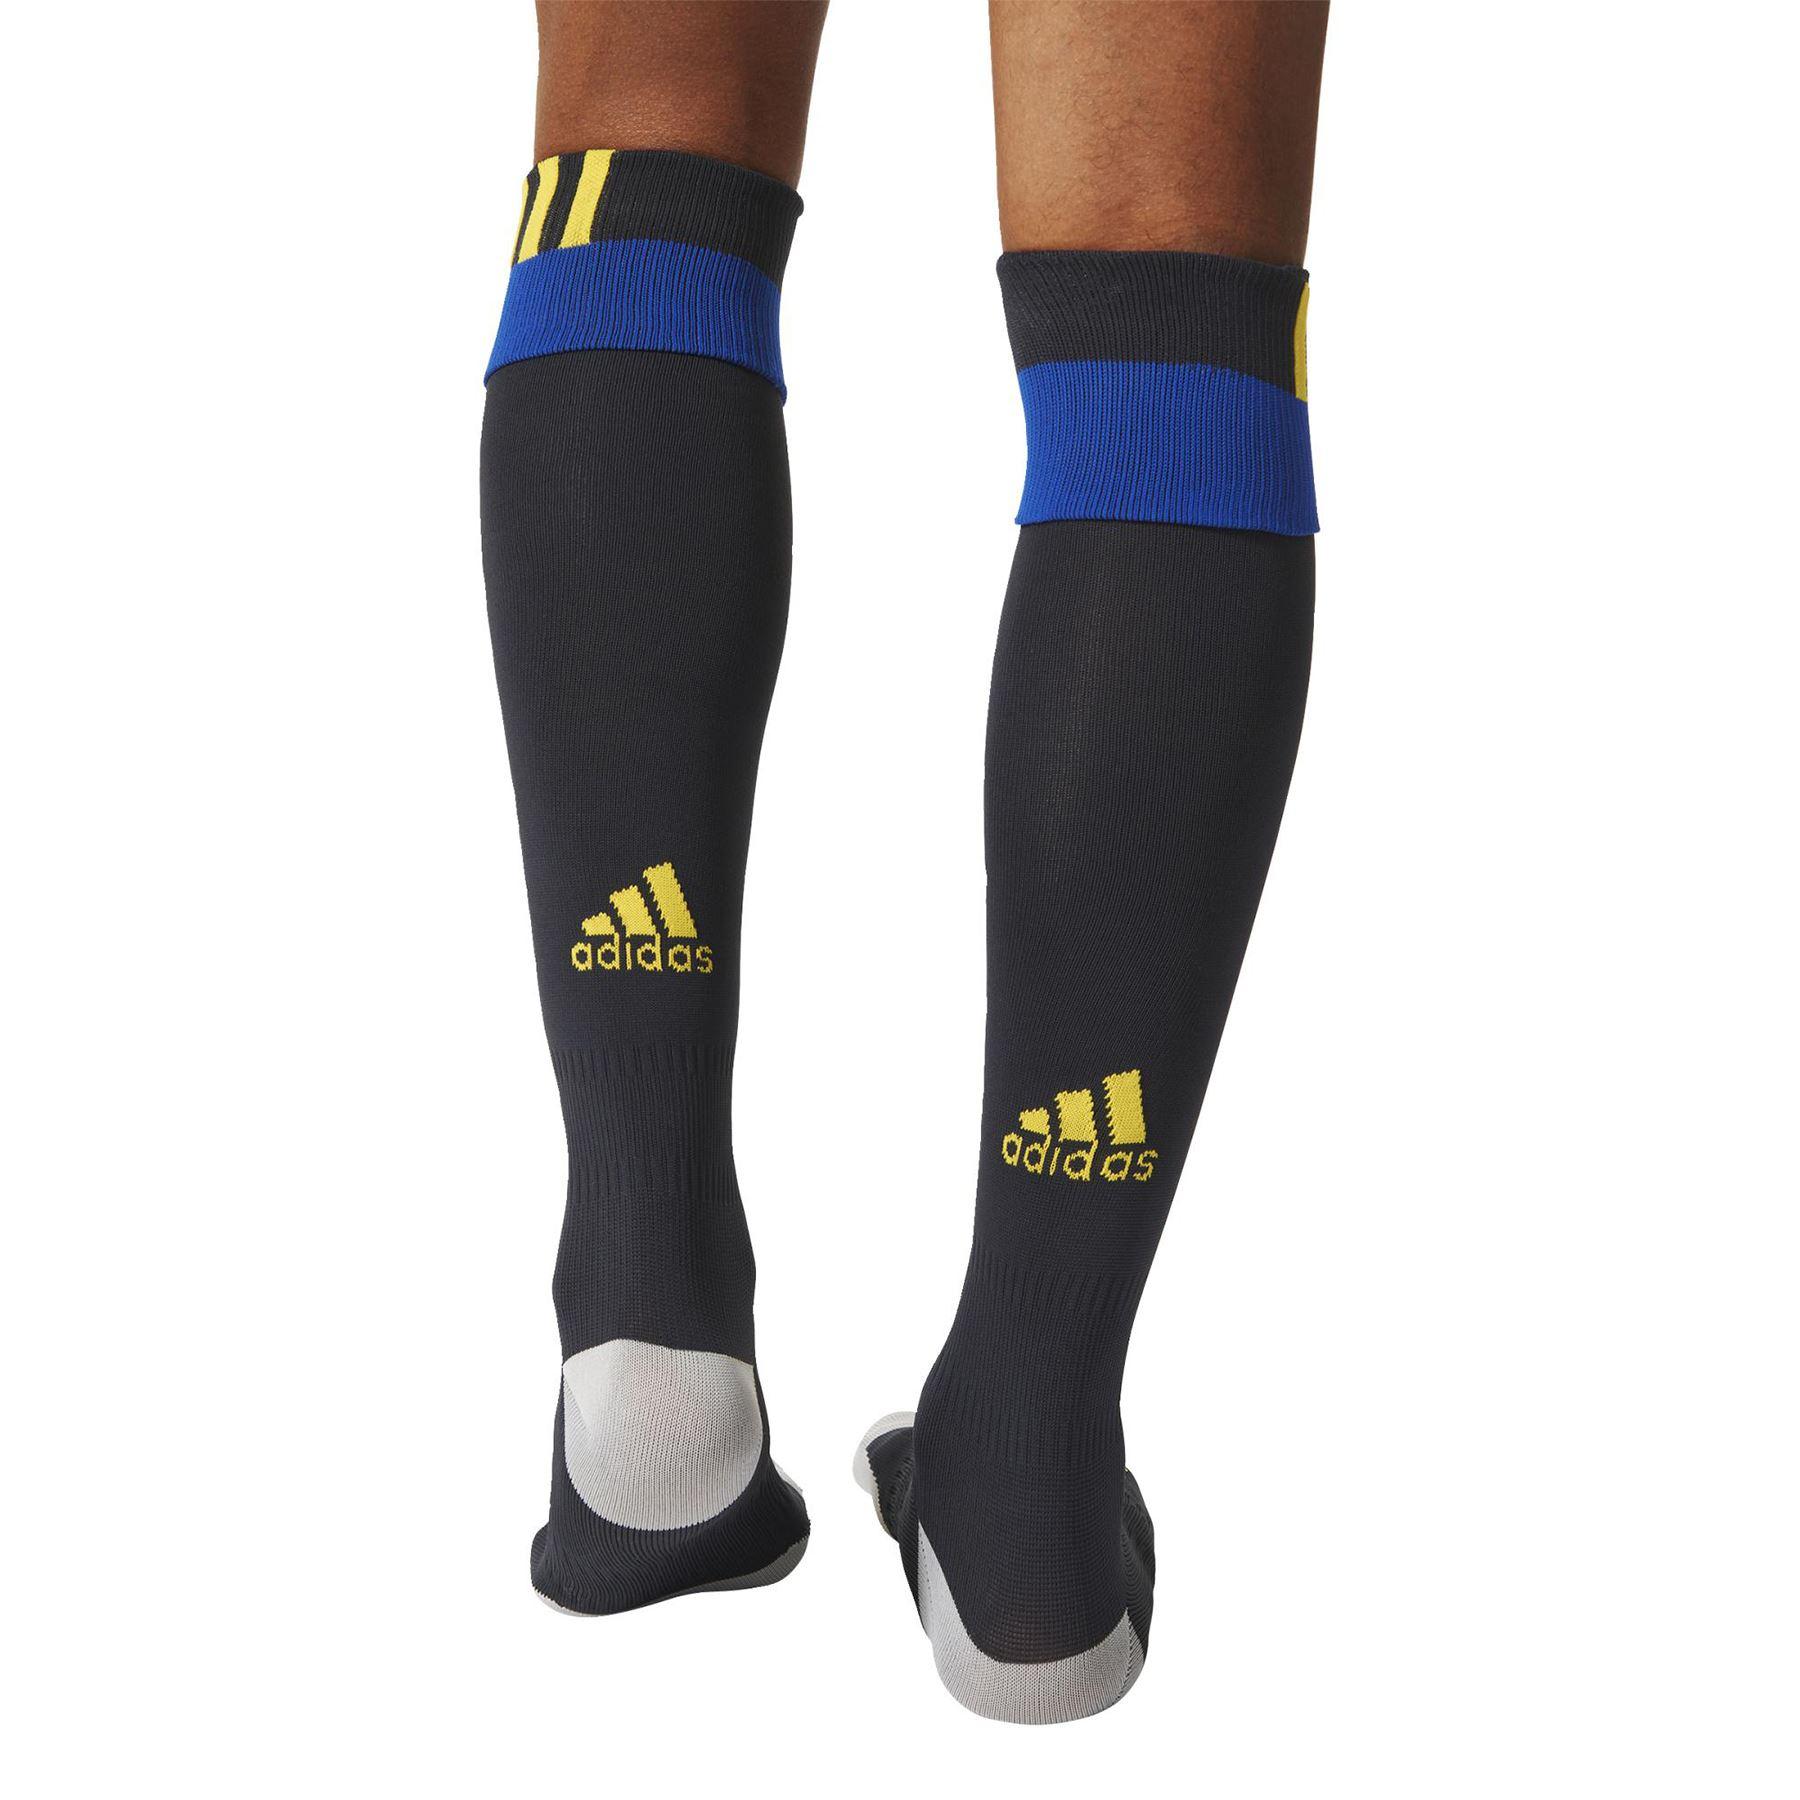 adidas Mens Spain Football Team Home Socks Accessory Euro ...